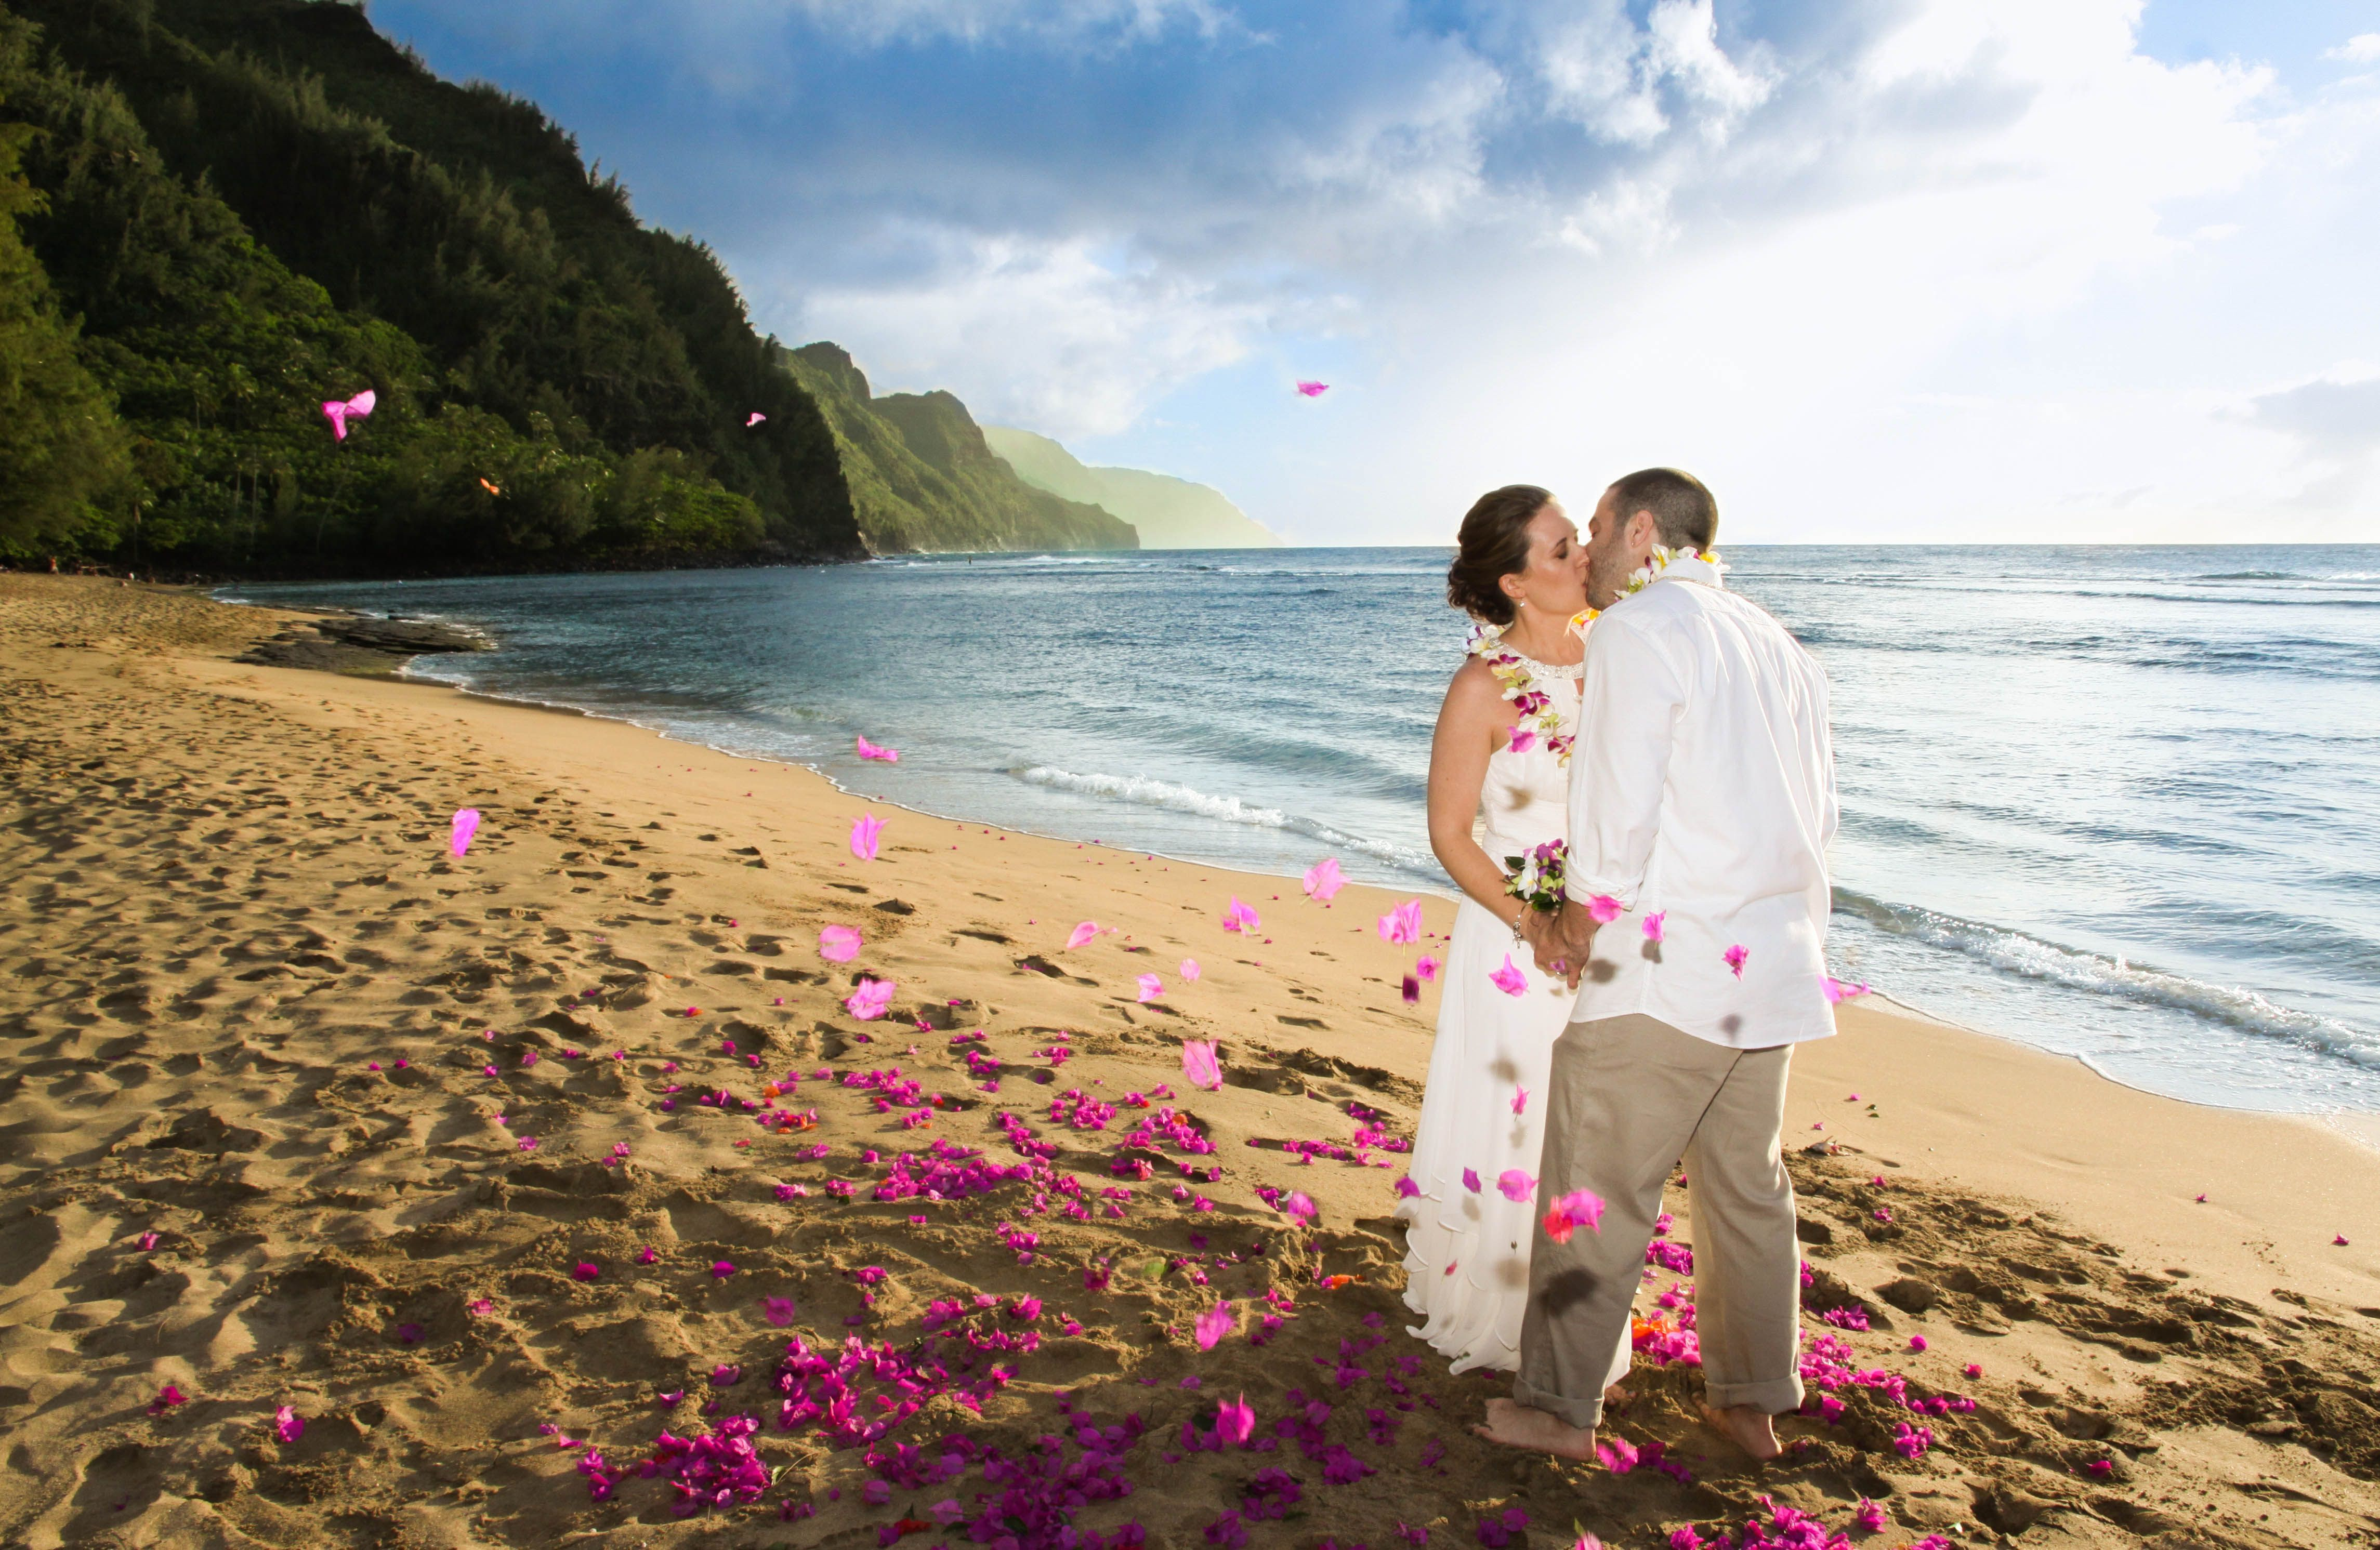 Kee Beach Kauai Hawaii North Shore Wedding Planner Destination